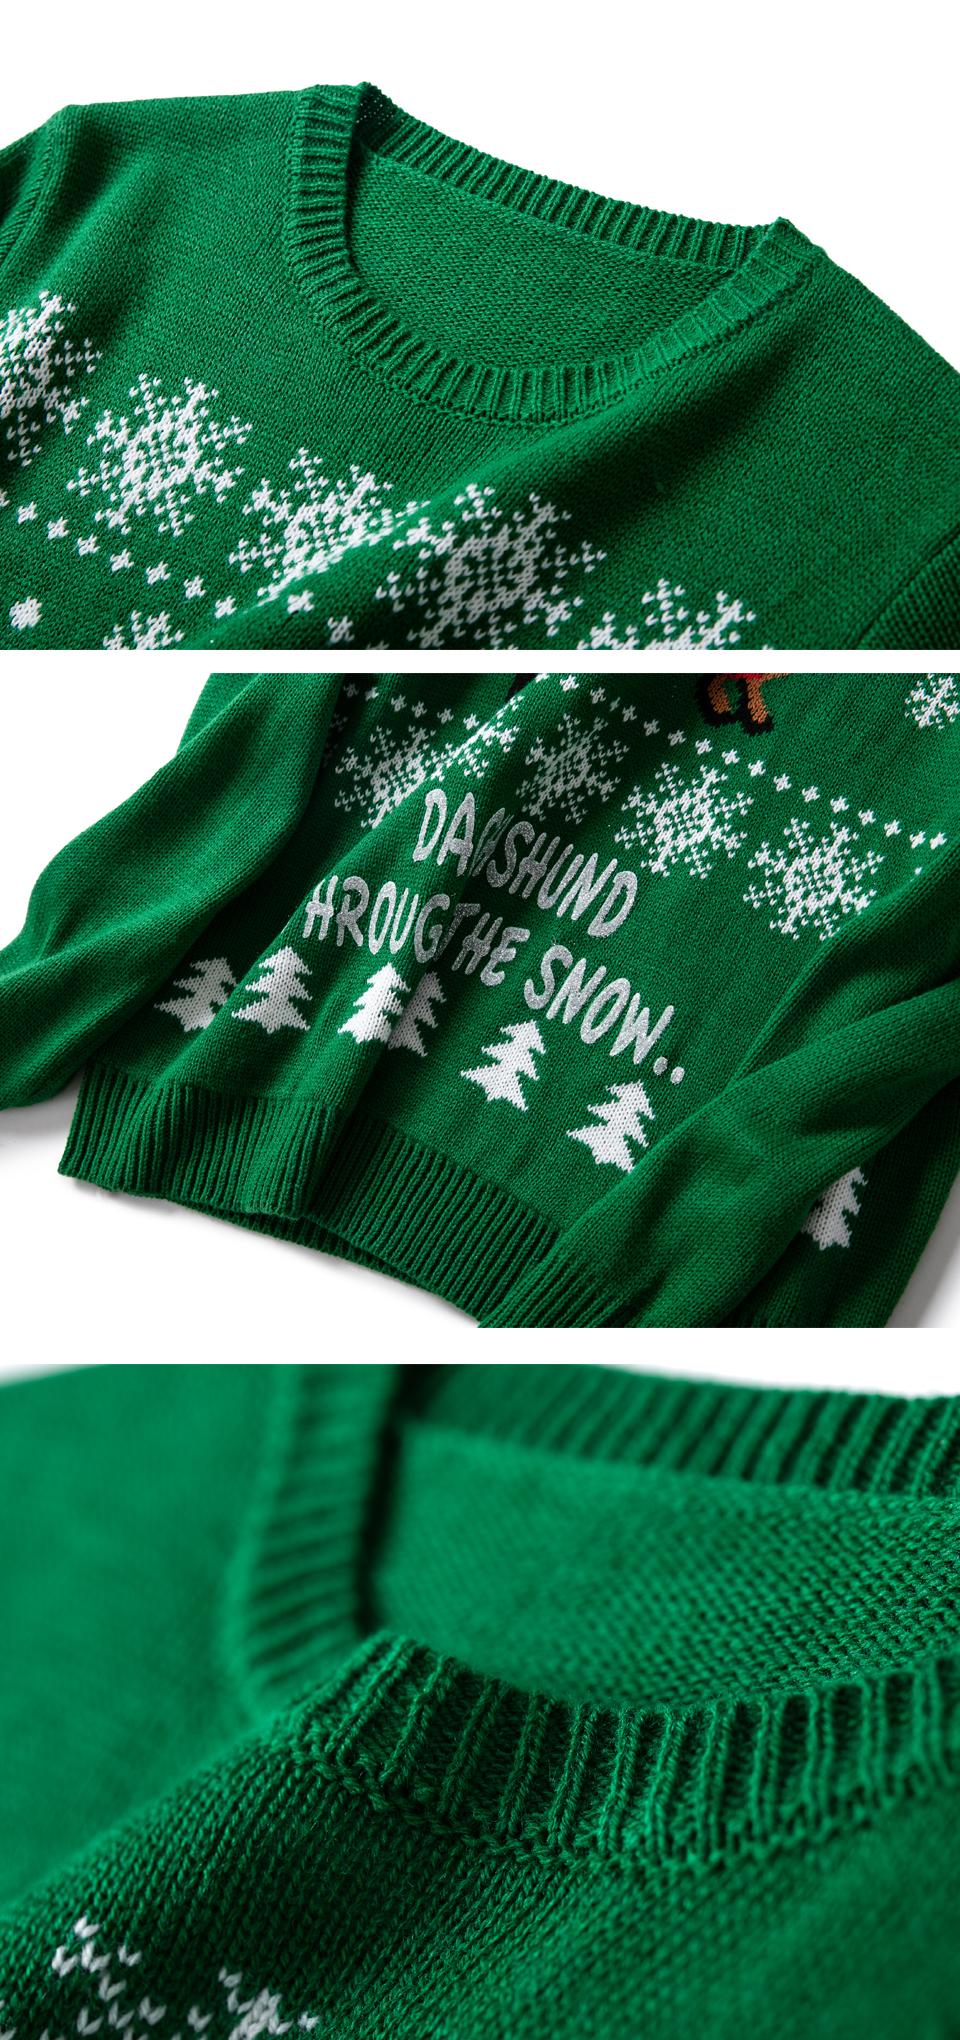 HTB14o emvBNTKJjSszeq6Au2VXaD - Christmas Sweater Cute Dachshund Embroidery Snow Letter Women Pullovers Long Sleeve Knitting Outwear PTC 287